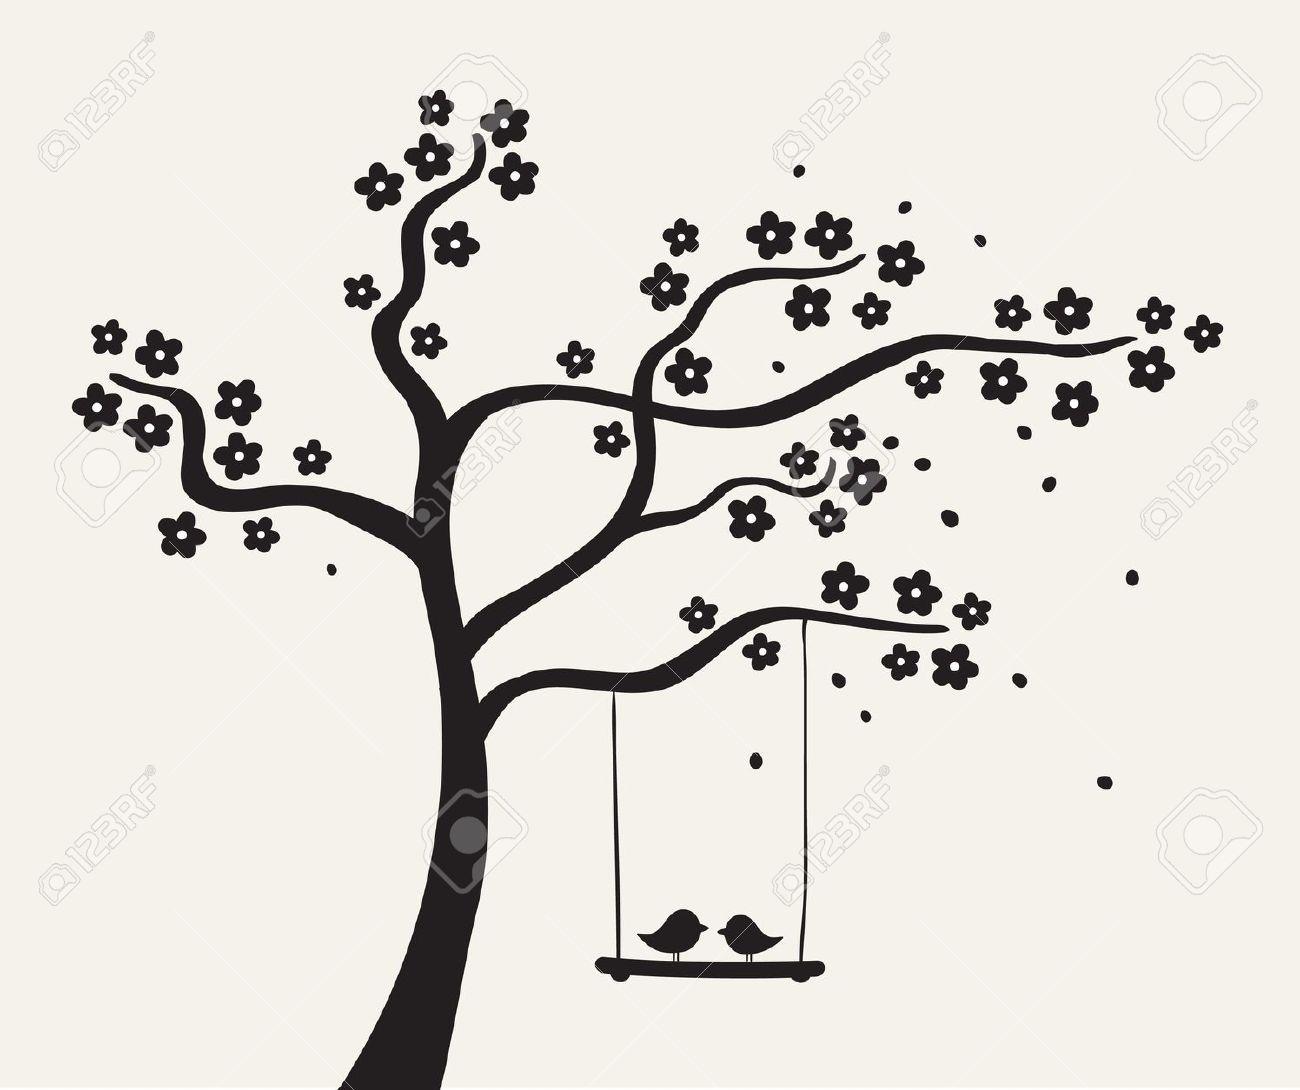 Illustration clipart tree bird silhouette Explore Flower Tree Silhouette